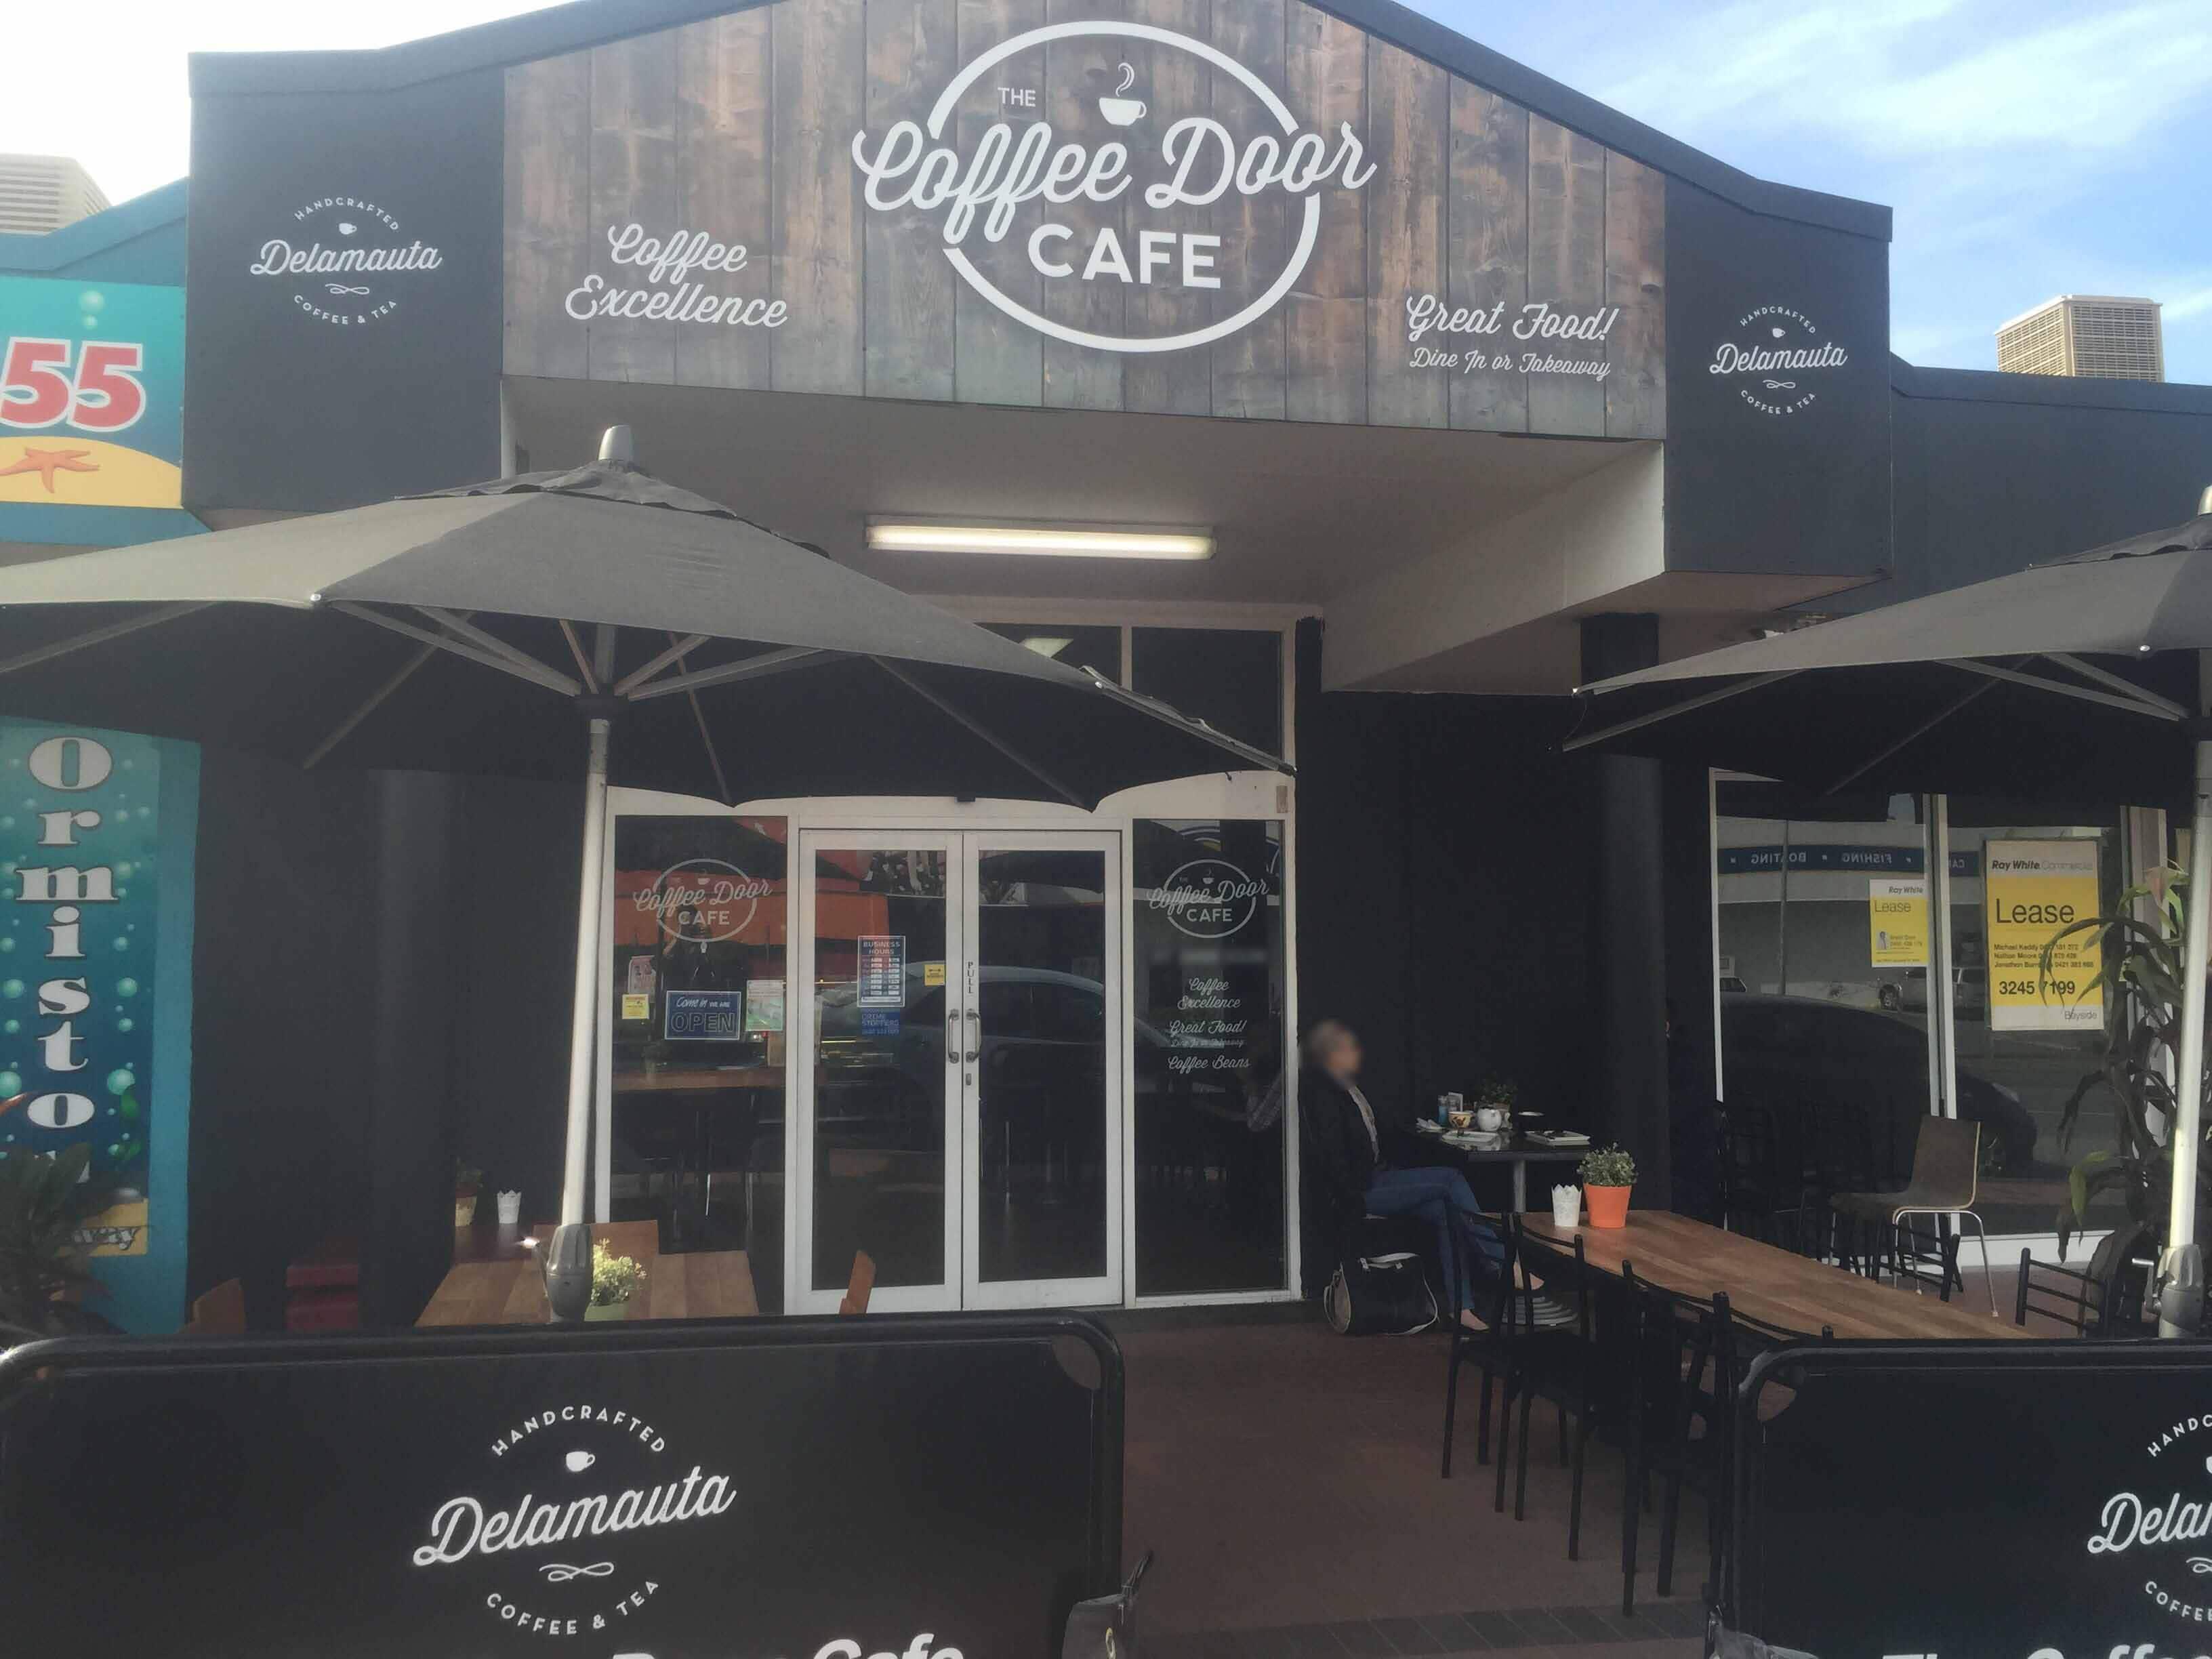 The Coffee Door Cafe Cleveland Photos & The Coffee Door Cafe Ormiston Brisbane - Urbanspoon/Zomato pezcame.com